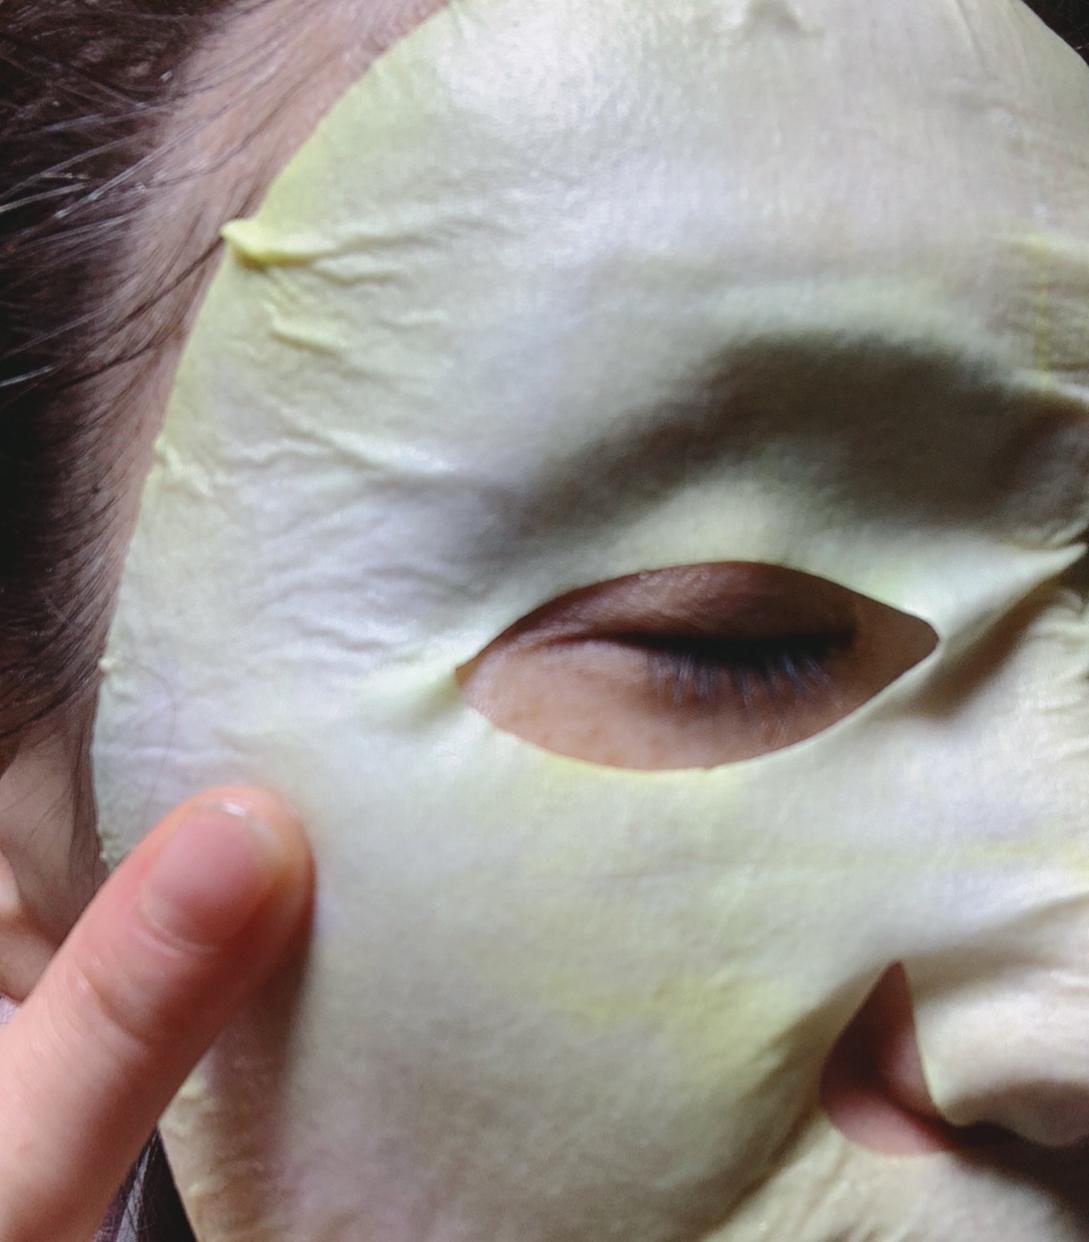 ReGen(リジェン) ハニーシールドマスクパックを使った渡邊 朋恵さんのクチコミ画像3